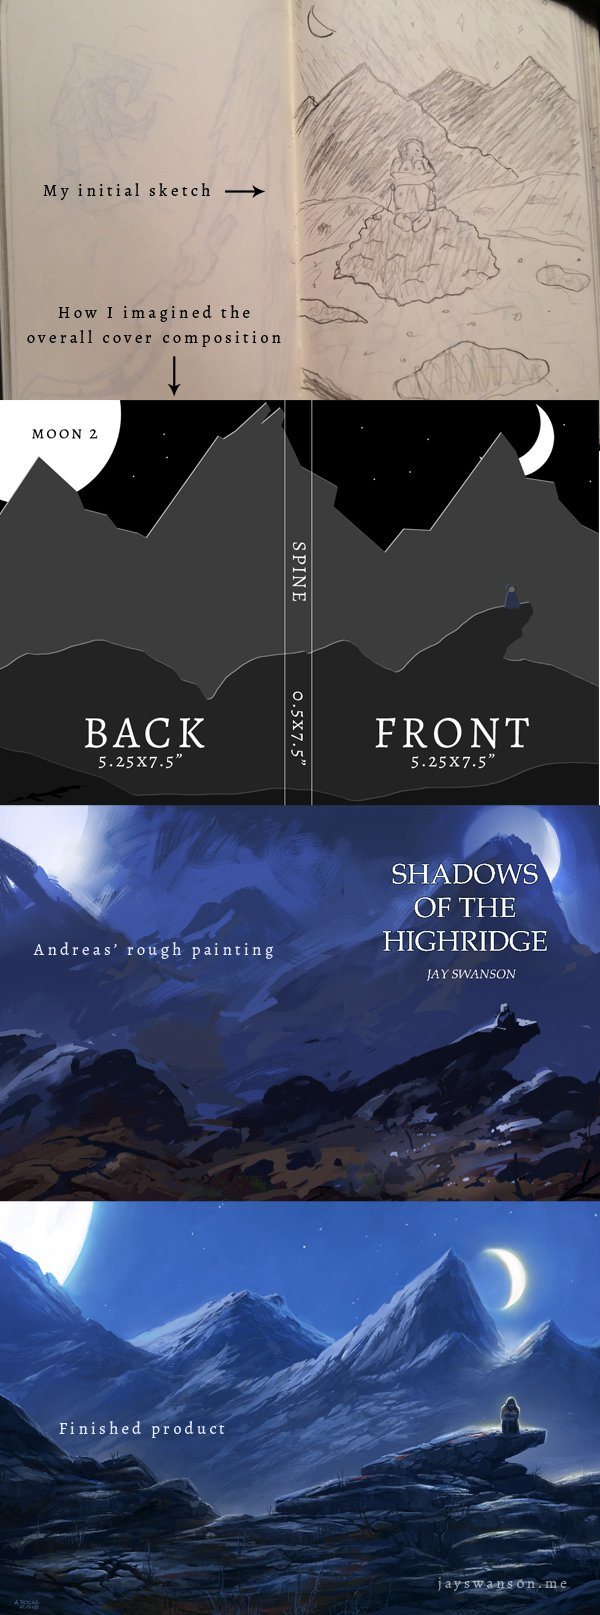 Shadows-of-the-Highridge-Cover-Progression